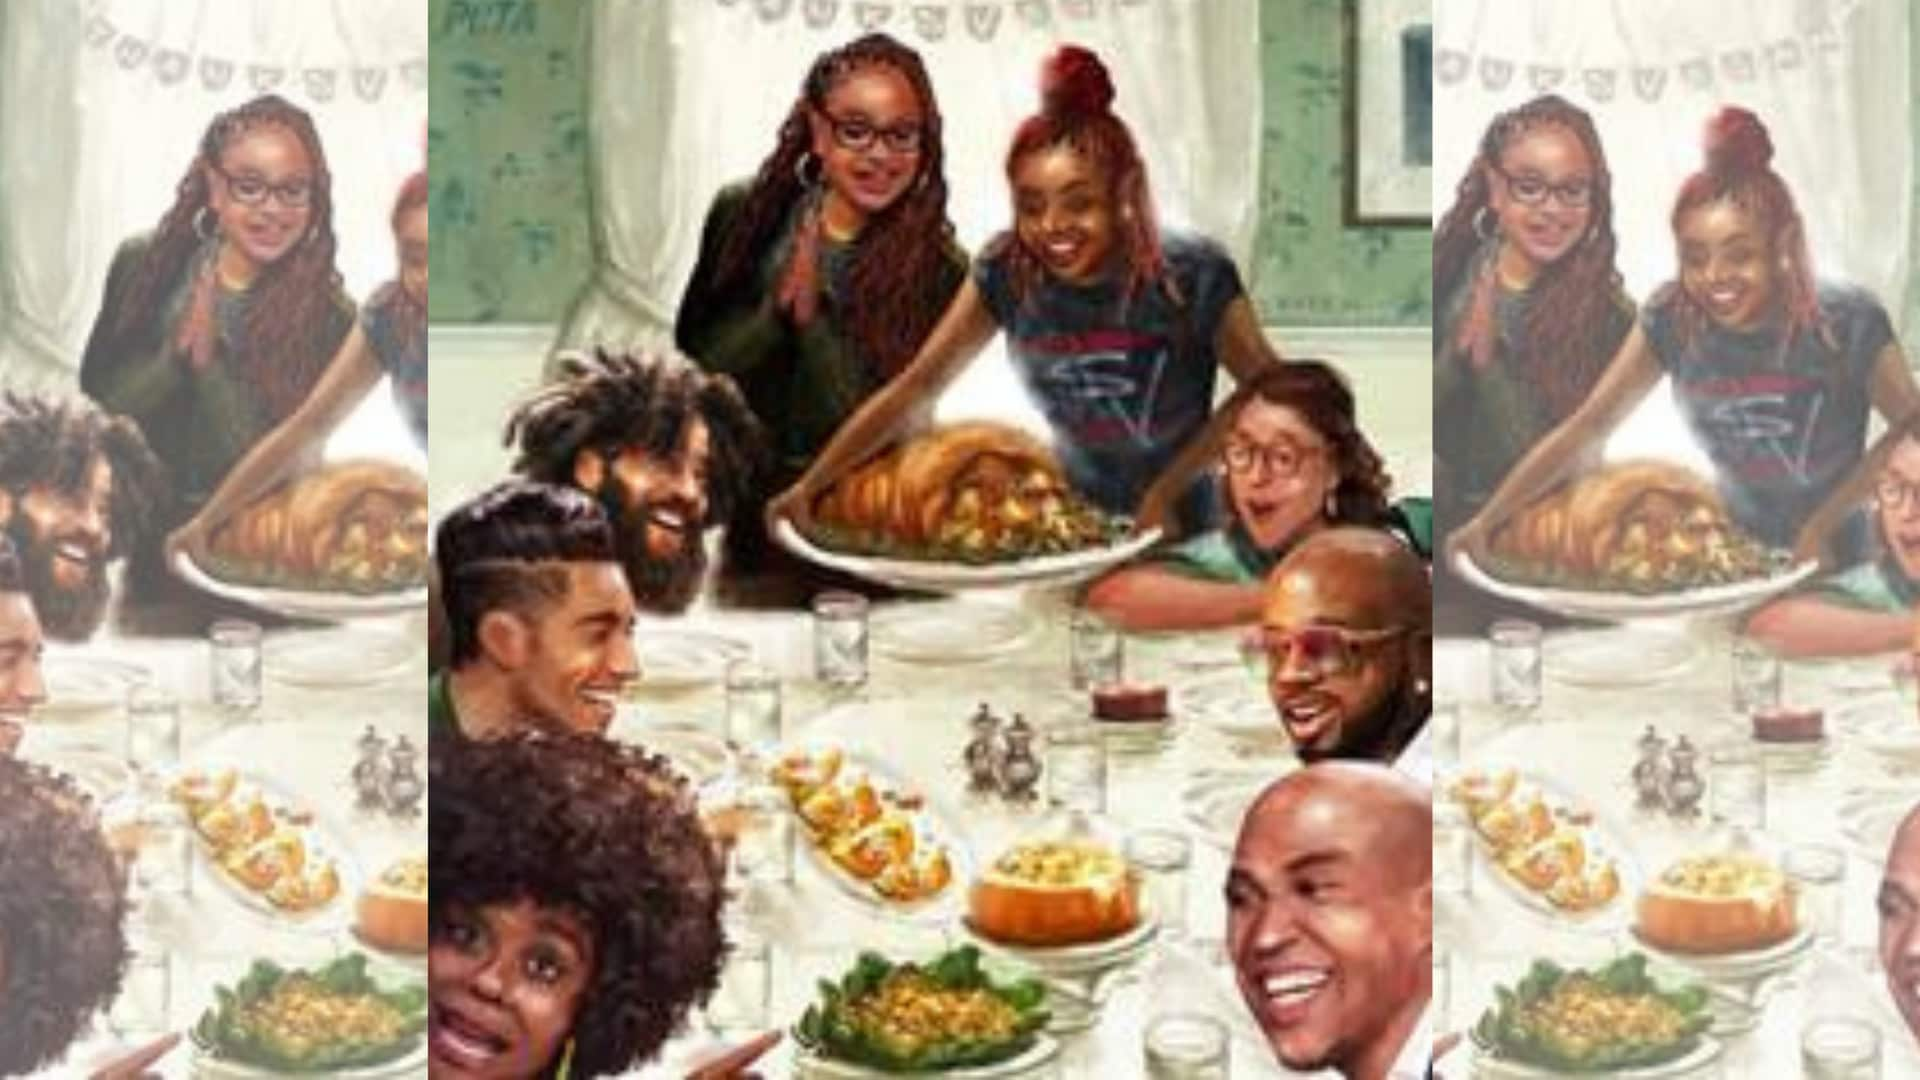 PETA reimagines famous Thanksgiving painting with vegan celebrities - TheGrio